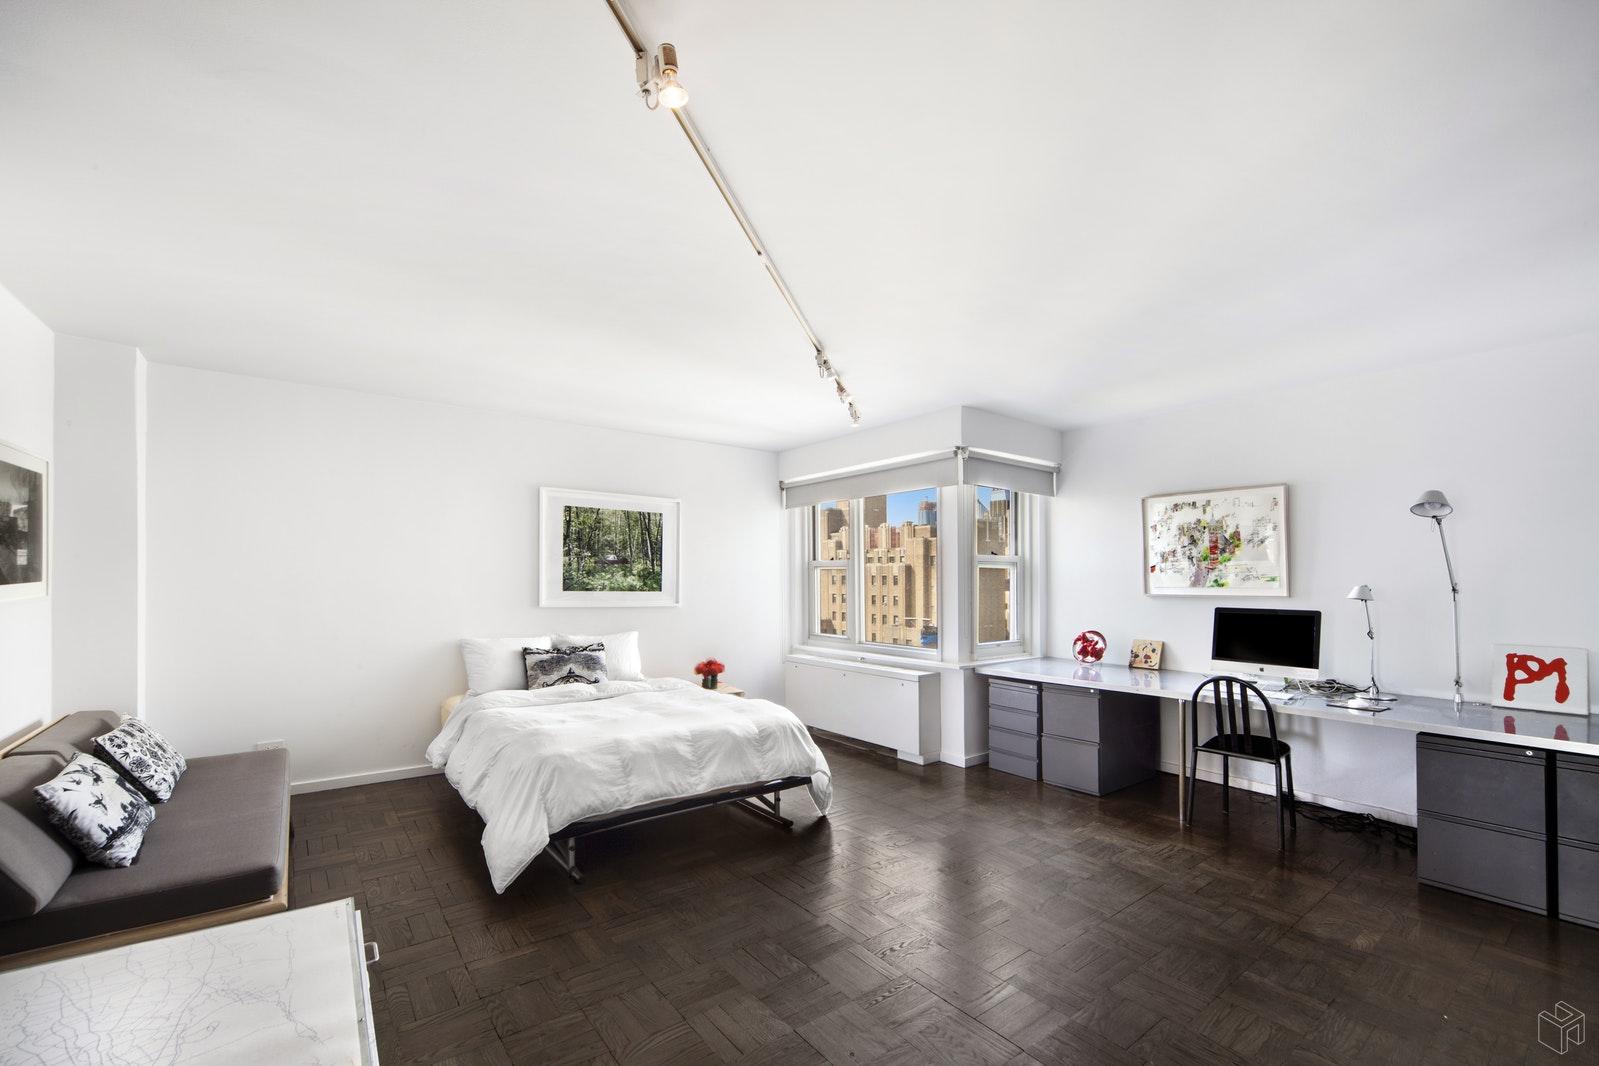 101 WEST 12TH STREET 20L, Greenwich Village, $5,250,000, Web #: 18527115